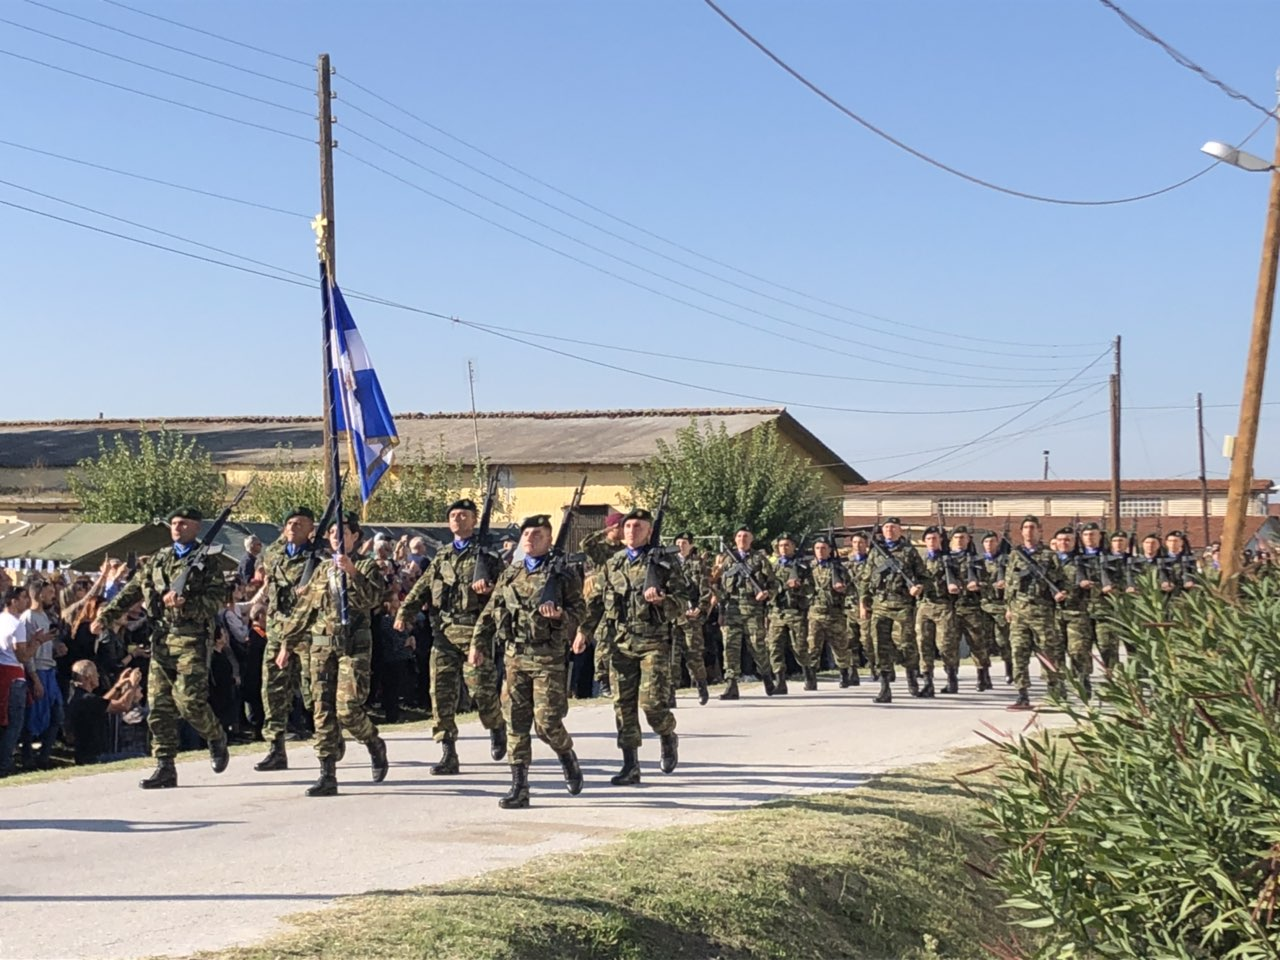 "orkomosia mpouga 2 - Στην ορκωμοσία νέων οπλιτών στο Στρατόπεδο ""Μπουγά"" ο Σεβασμιώτατος"